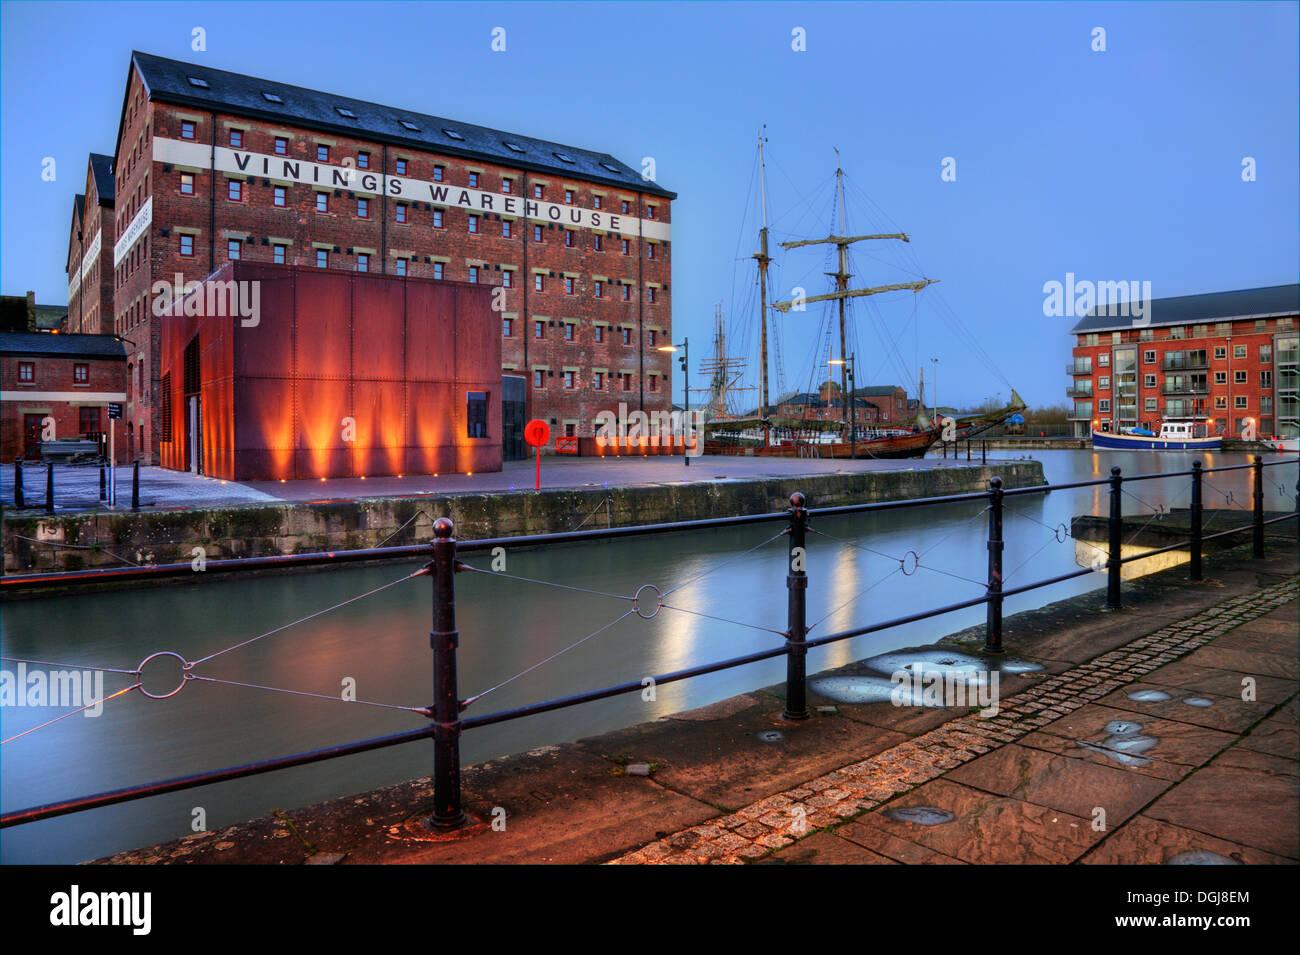 Gloucester Dock at night. - Stock Image